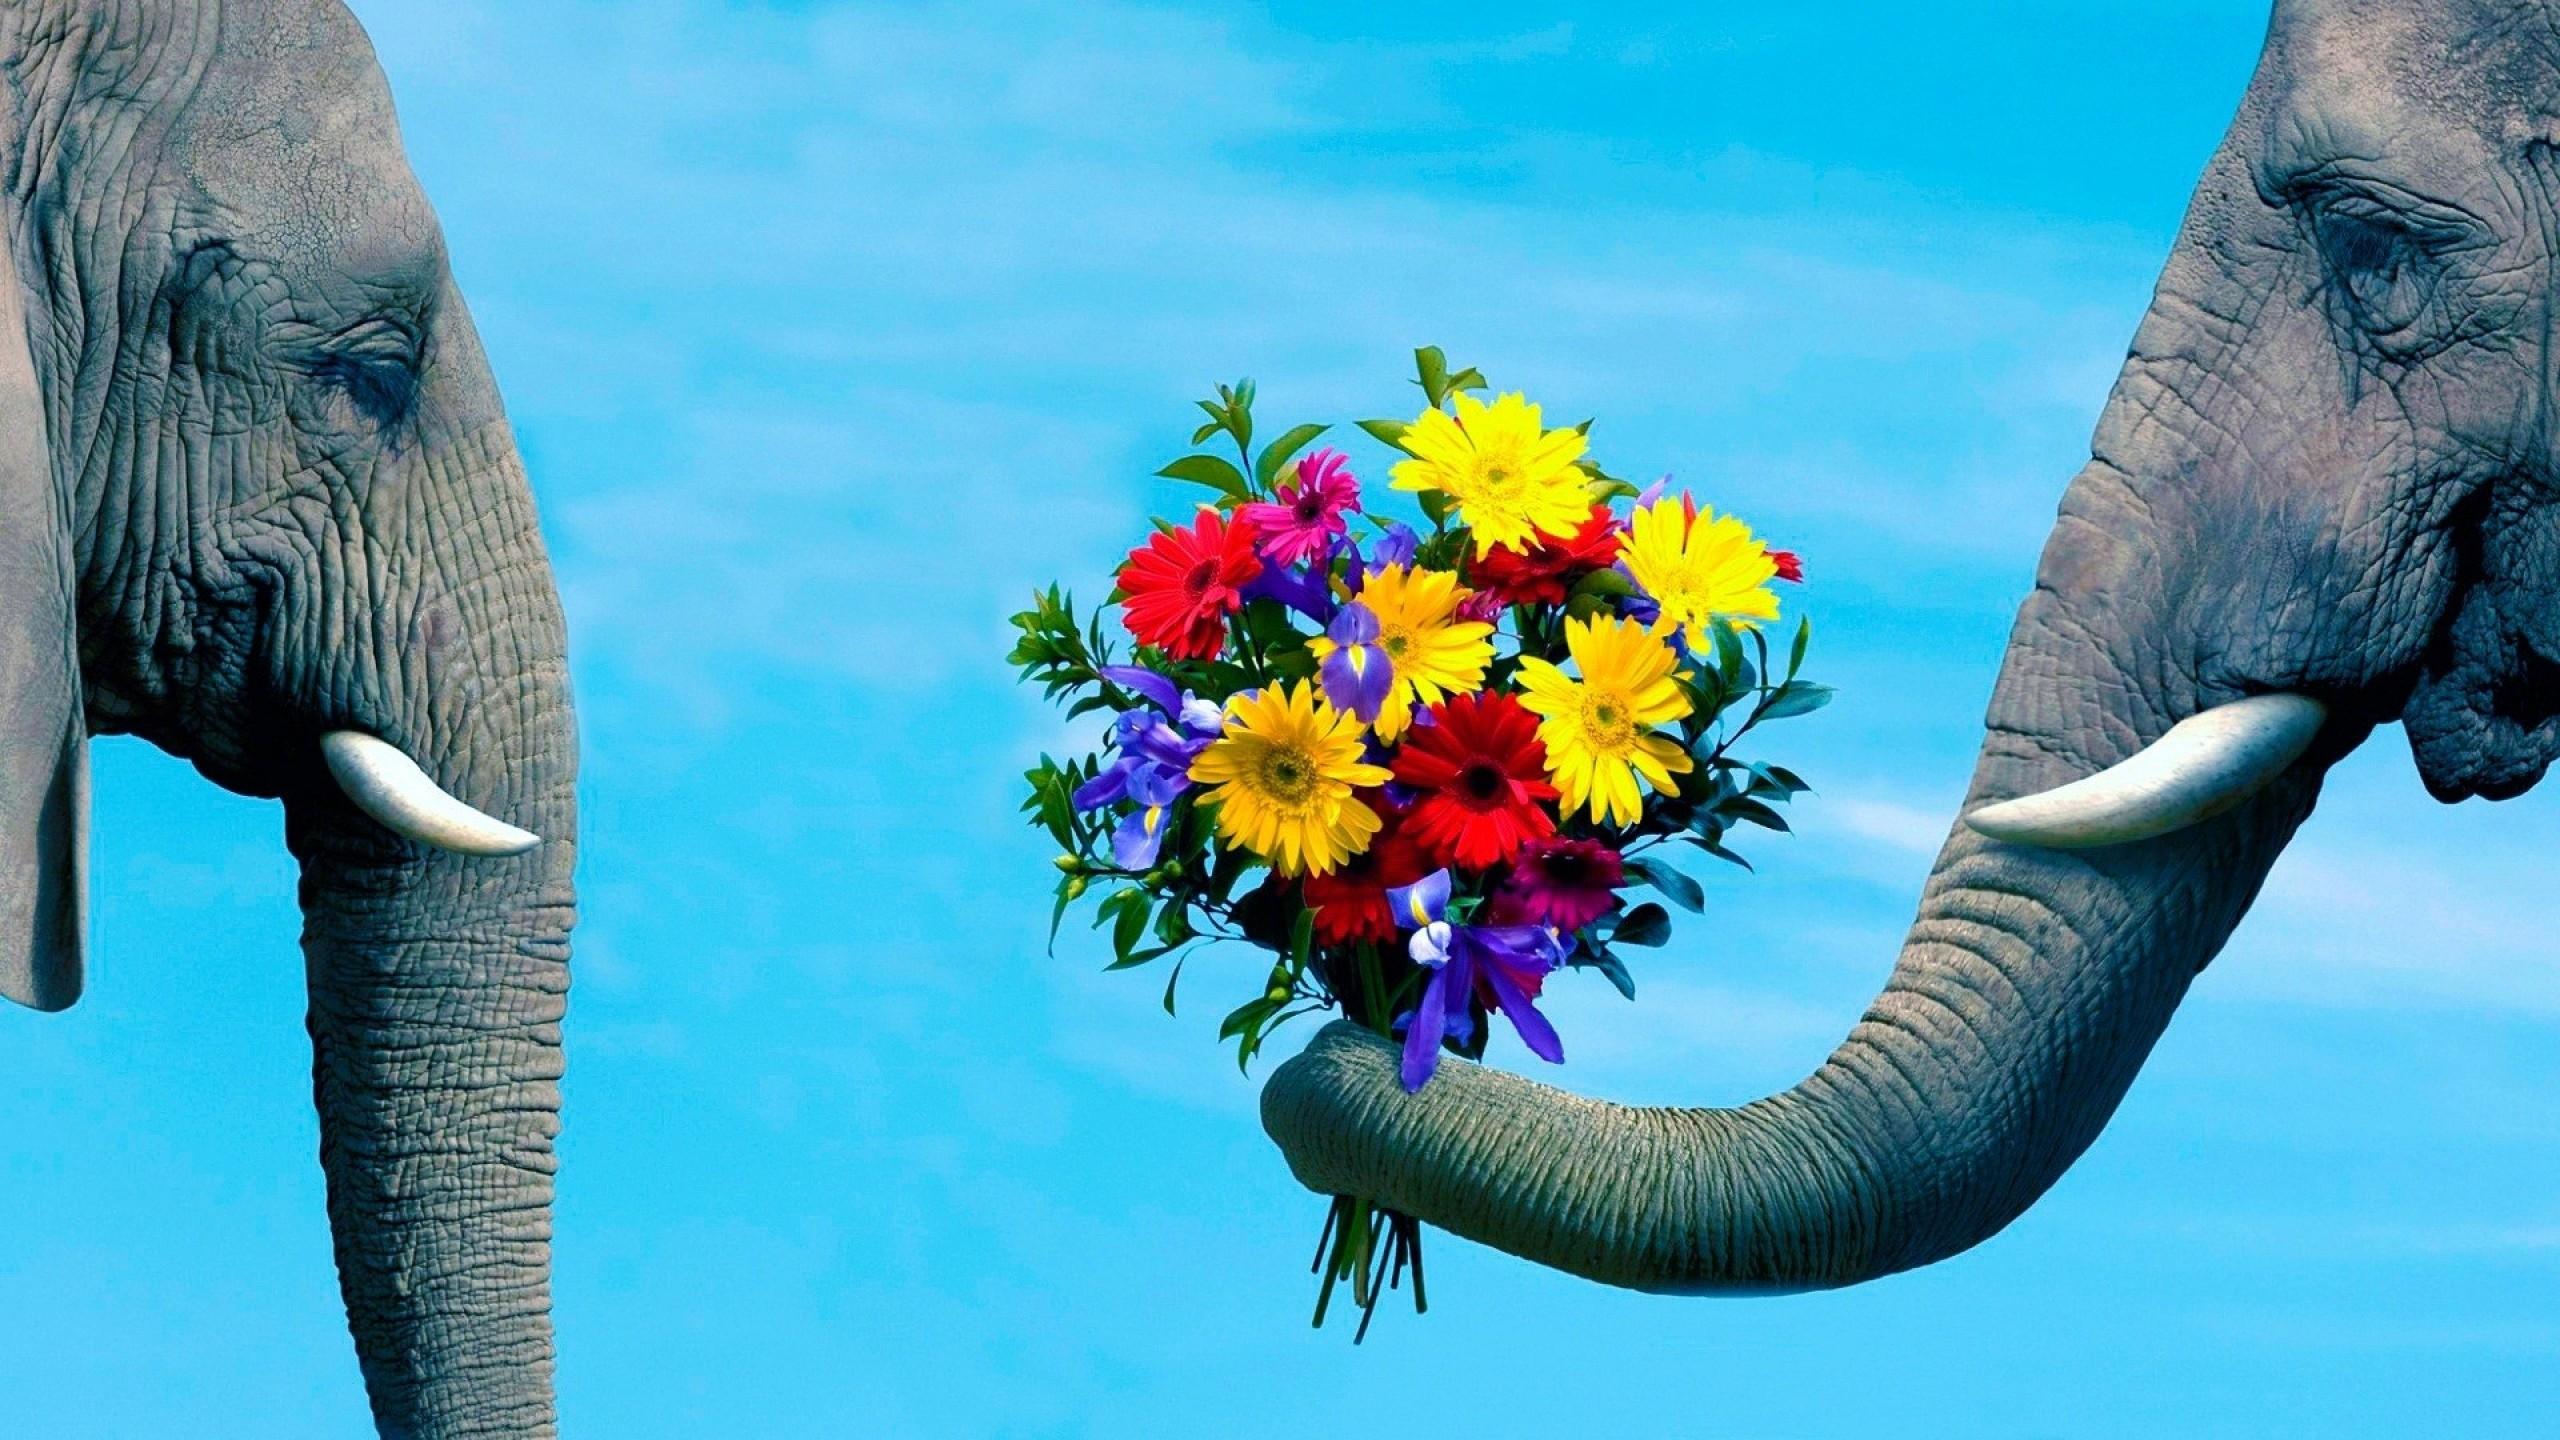 Elephant Desktop Backgrounds 70 Pictures